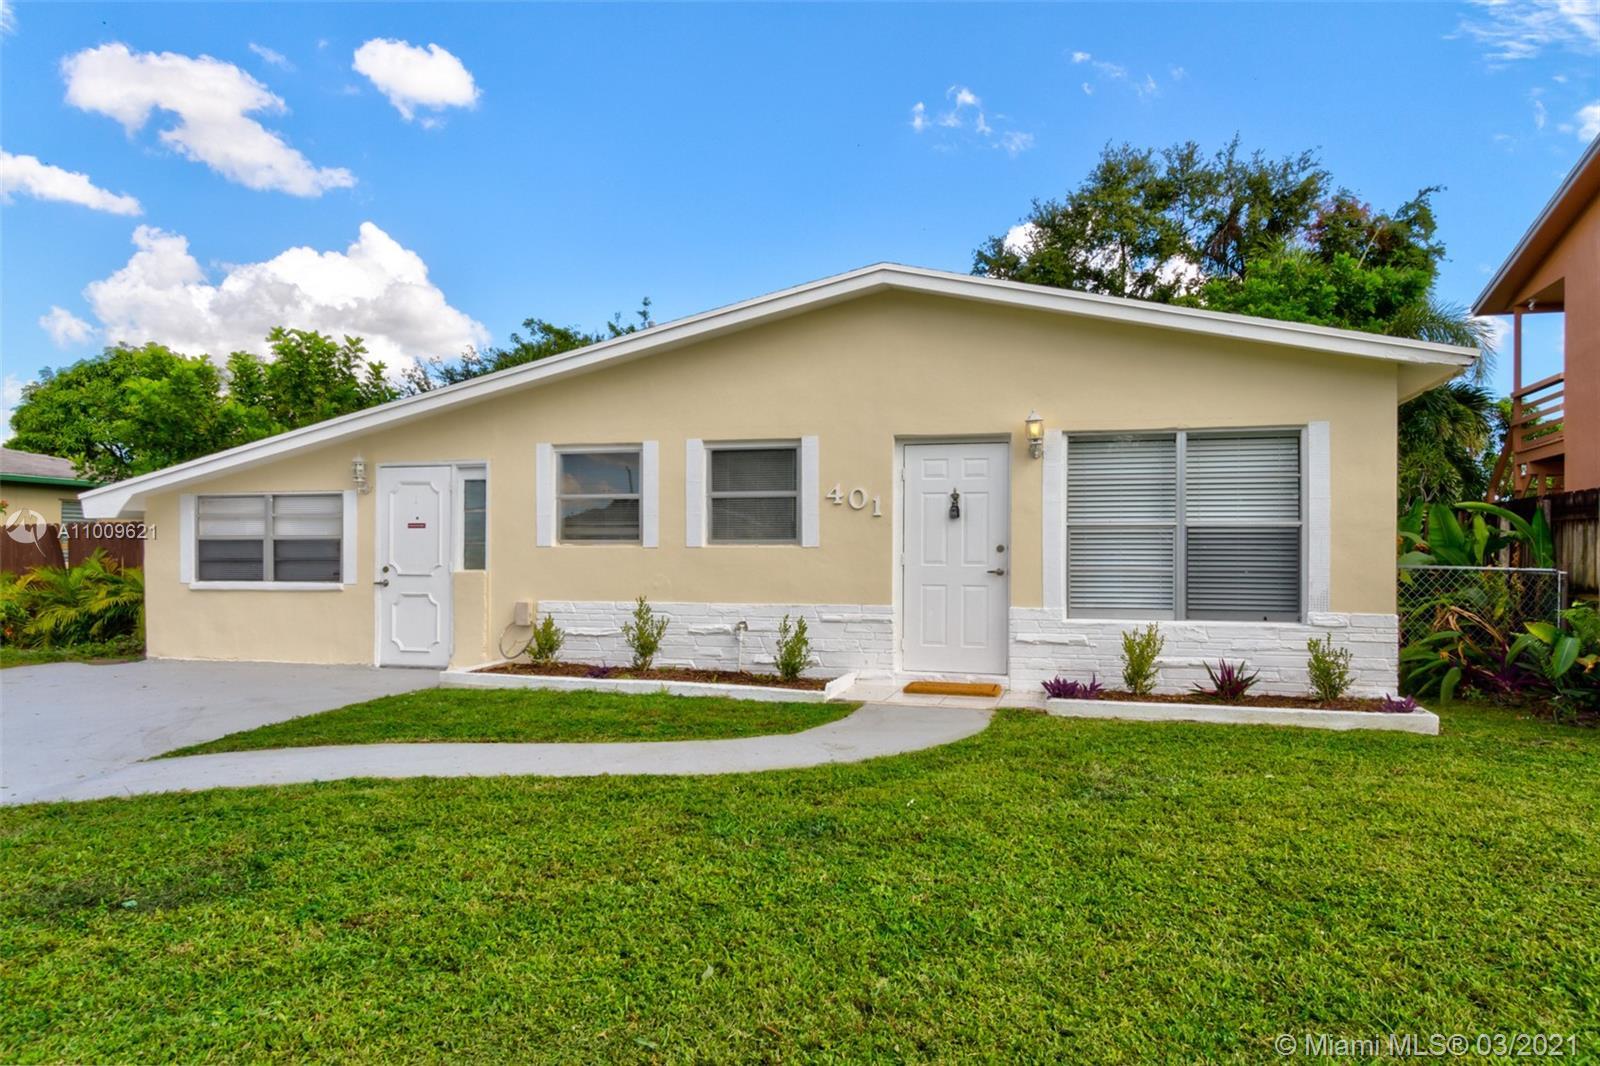 Boulevard Heights #N/A - 401 SW 68th Ave #N/A, Pembroke Pines, FL 33023